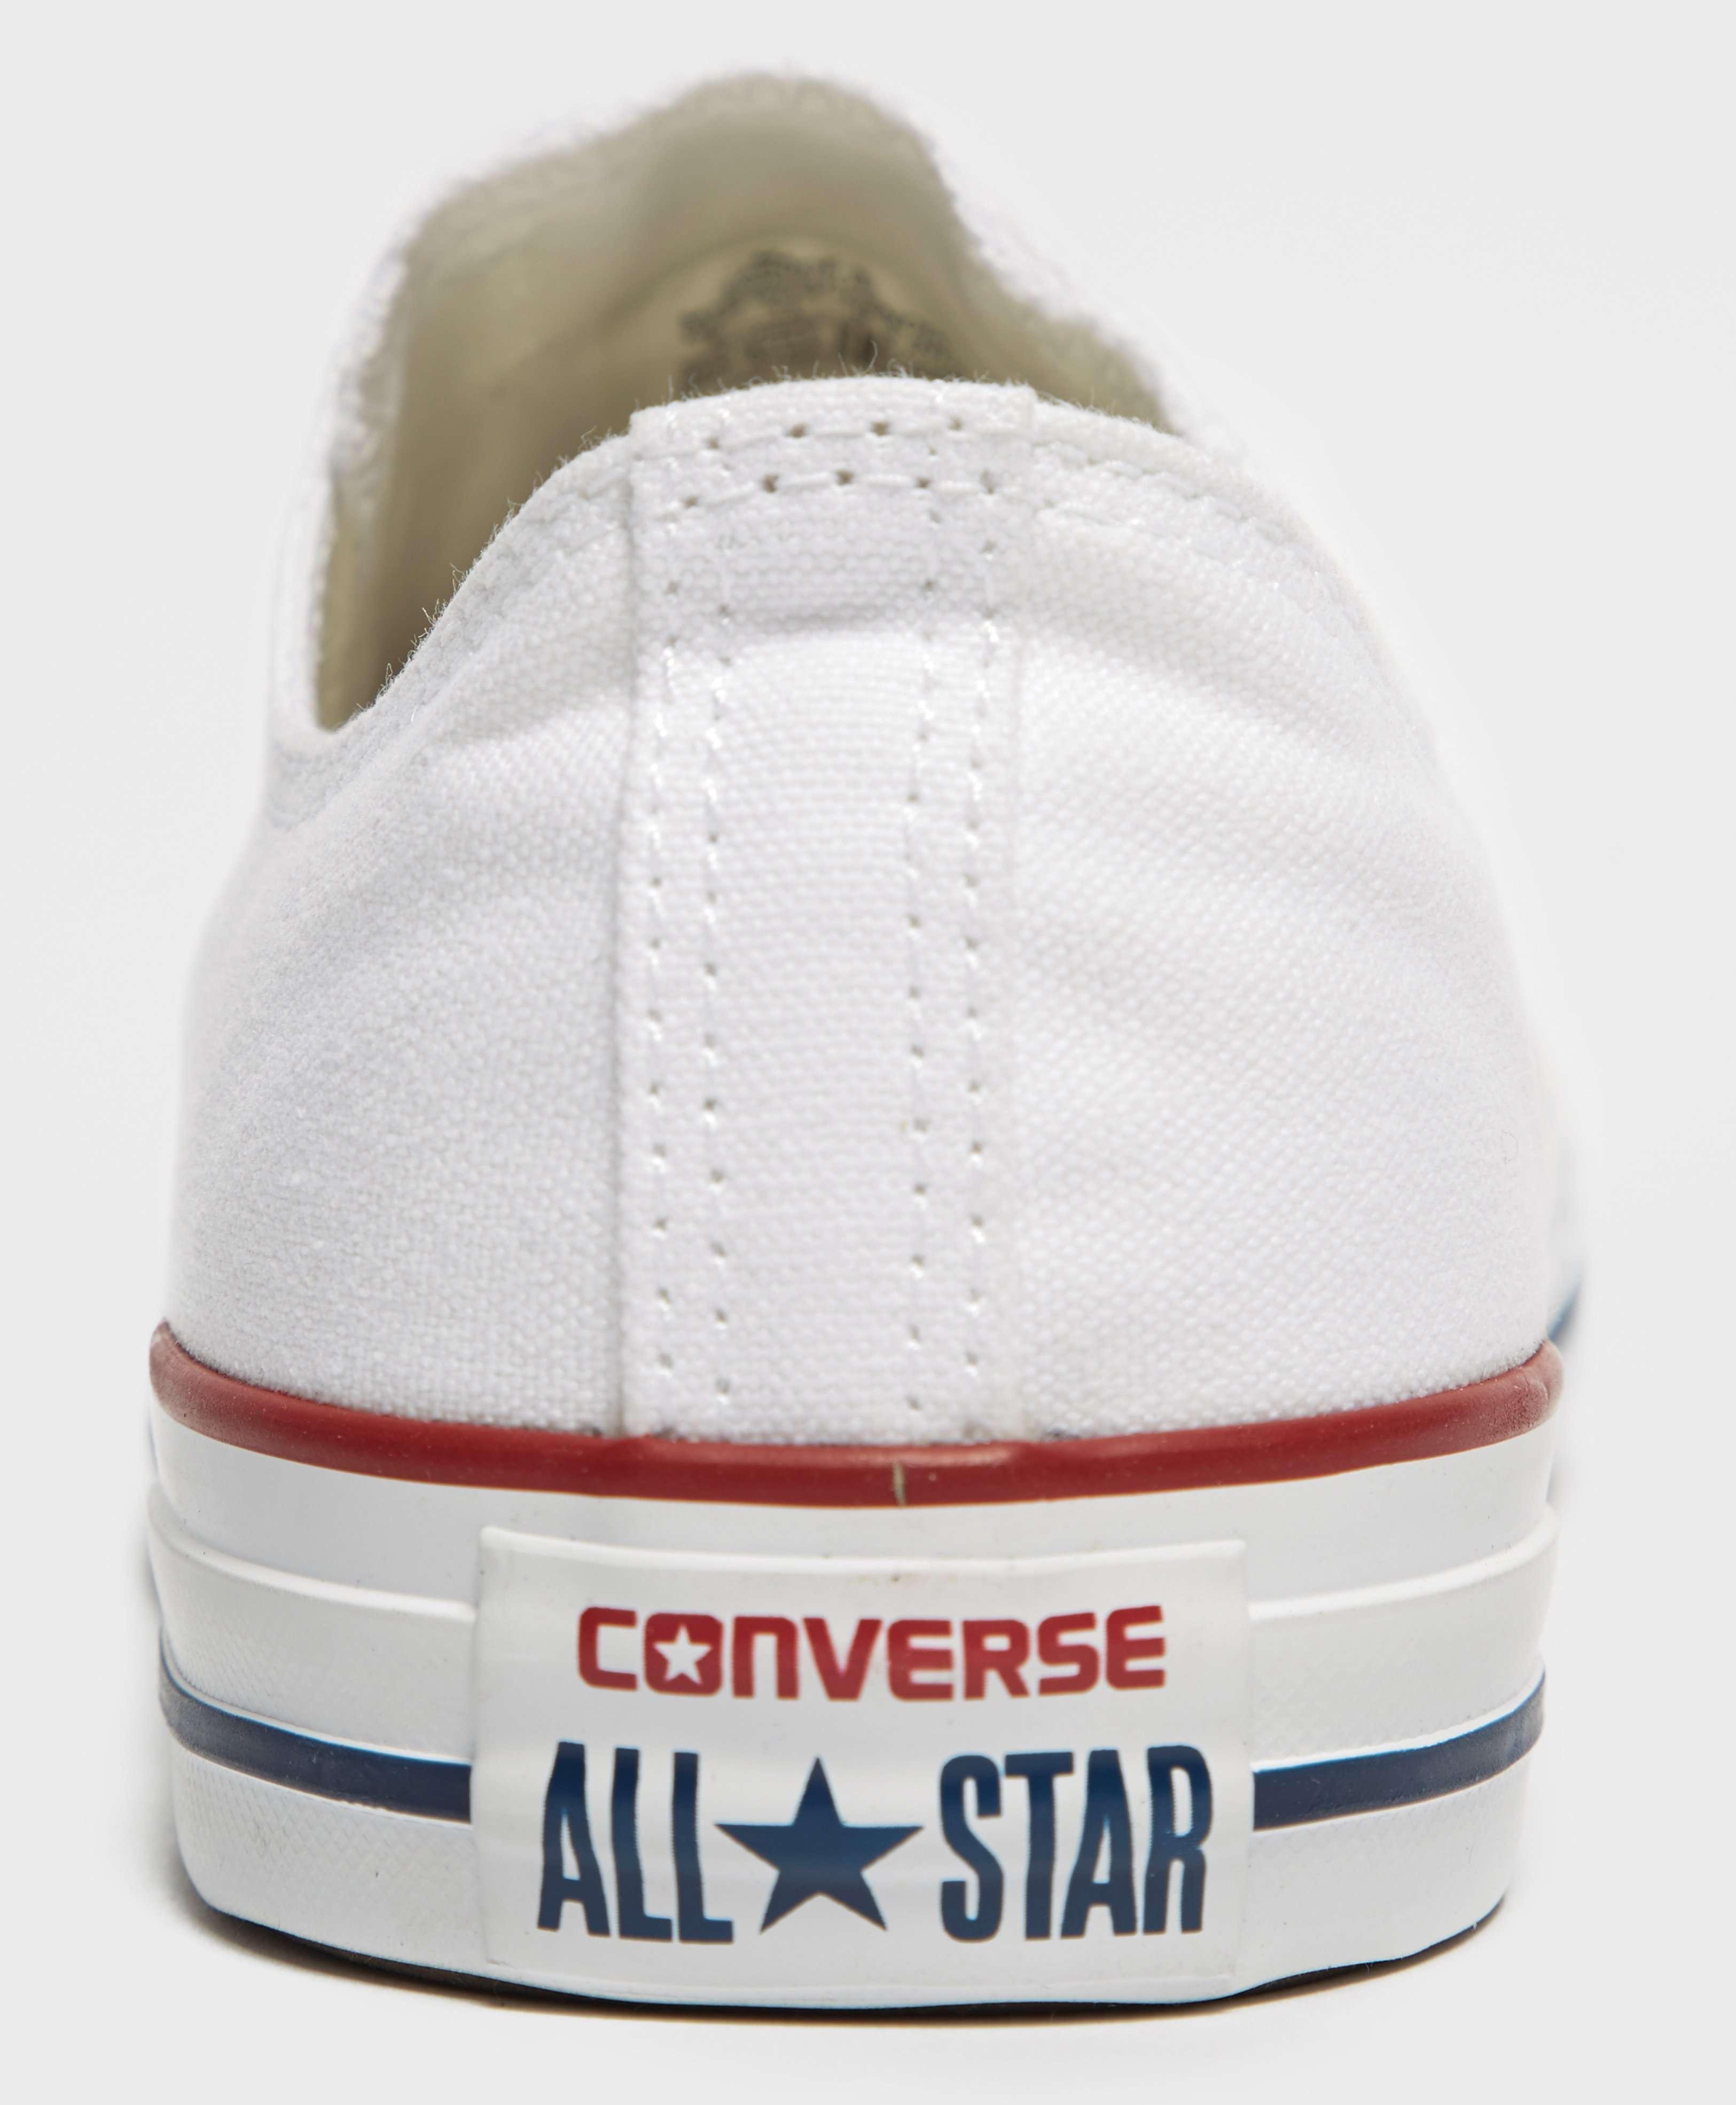 Converse All Star Ox